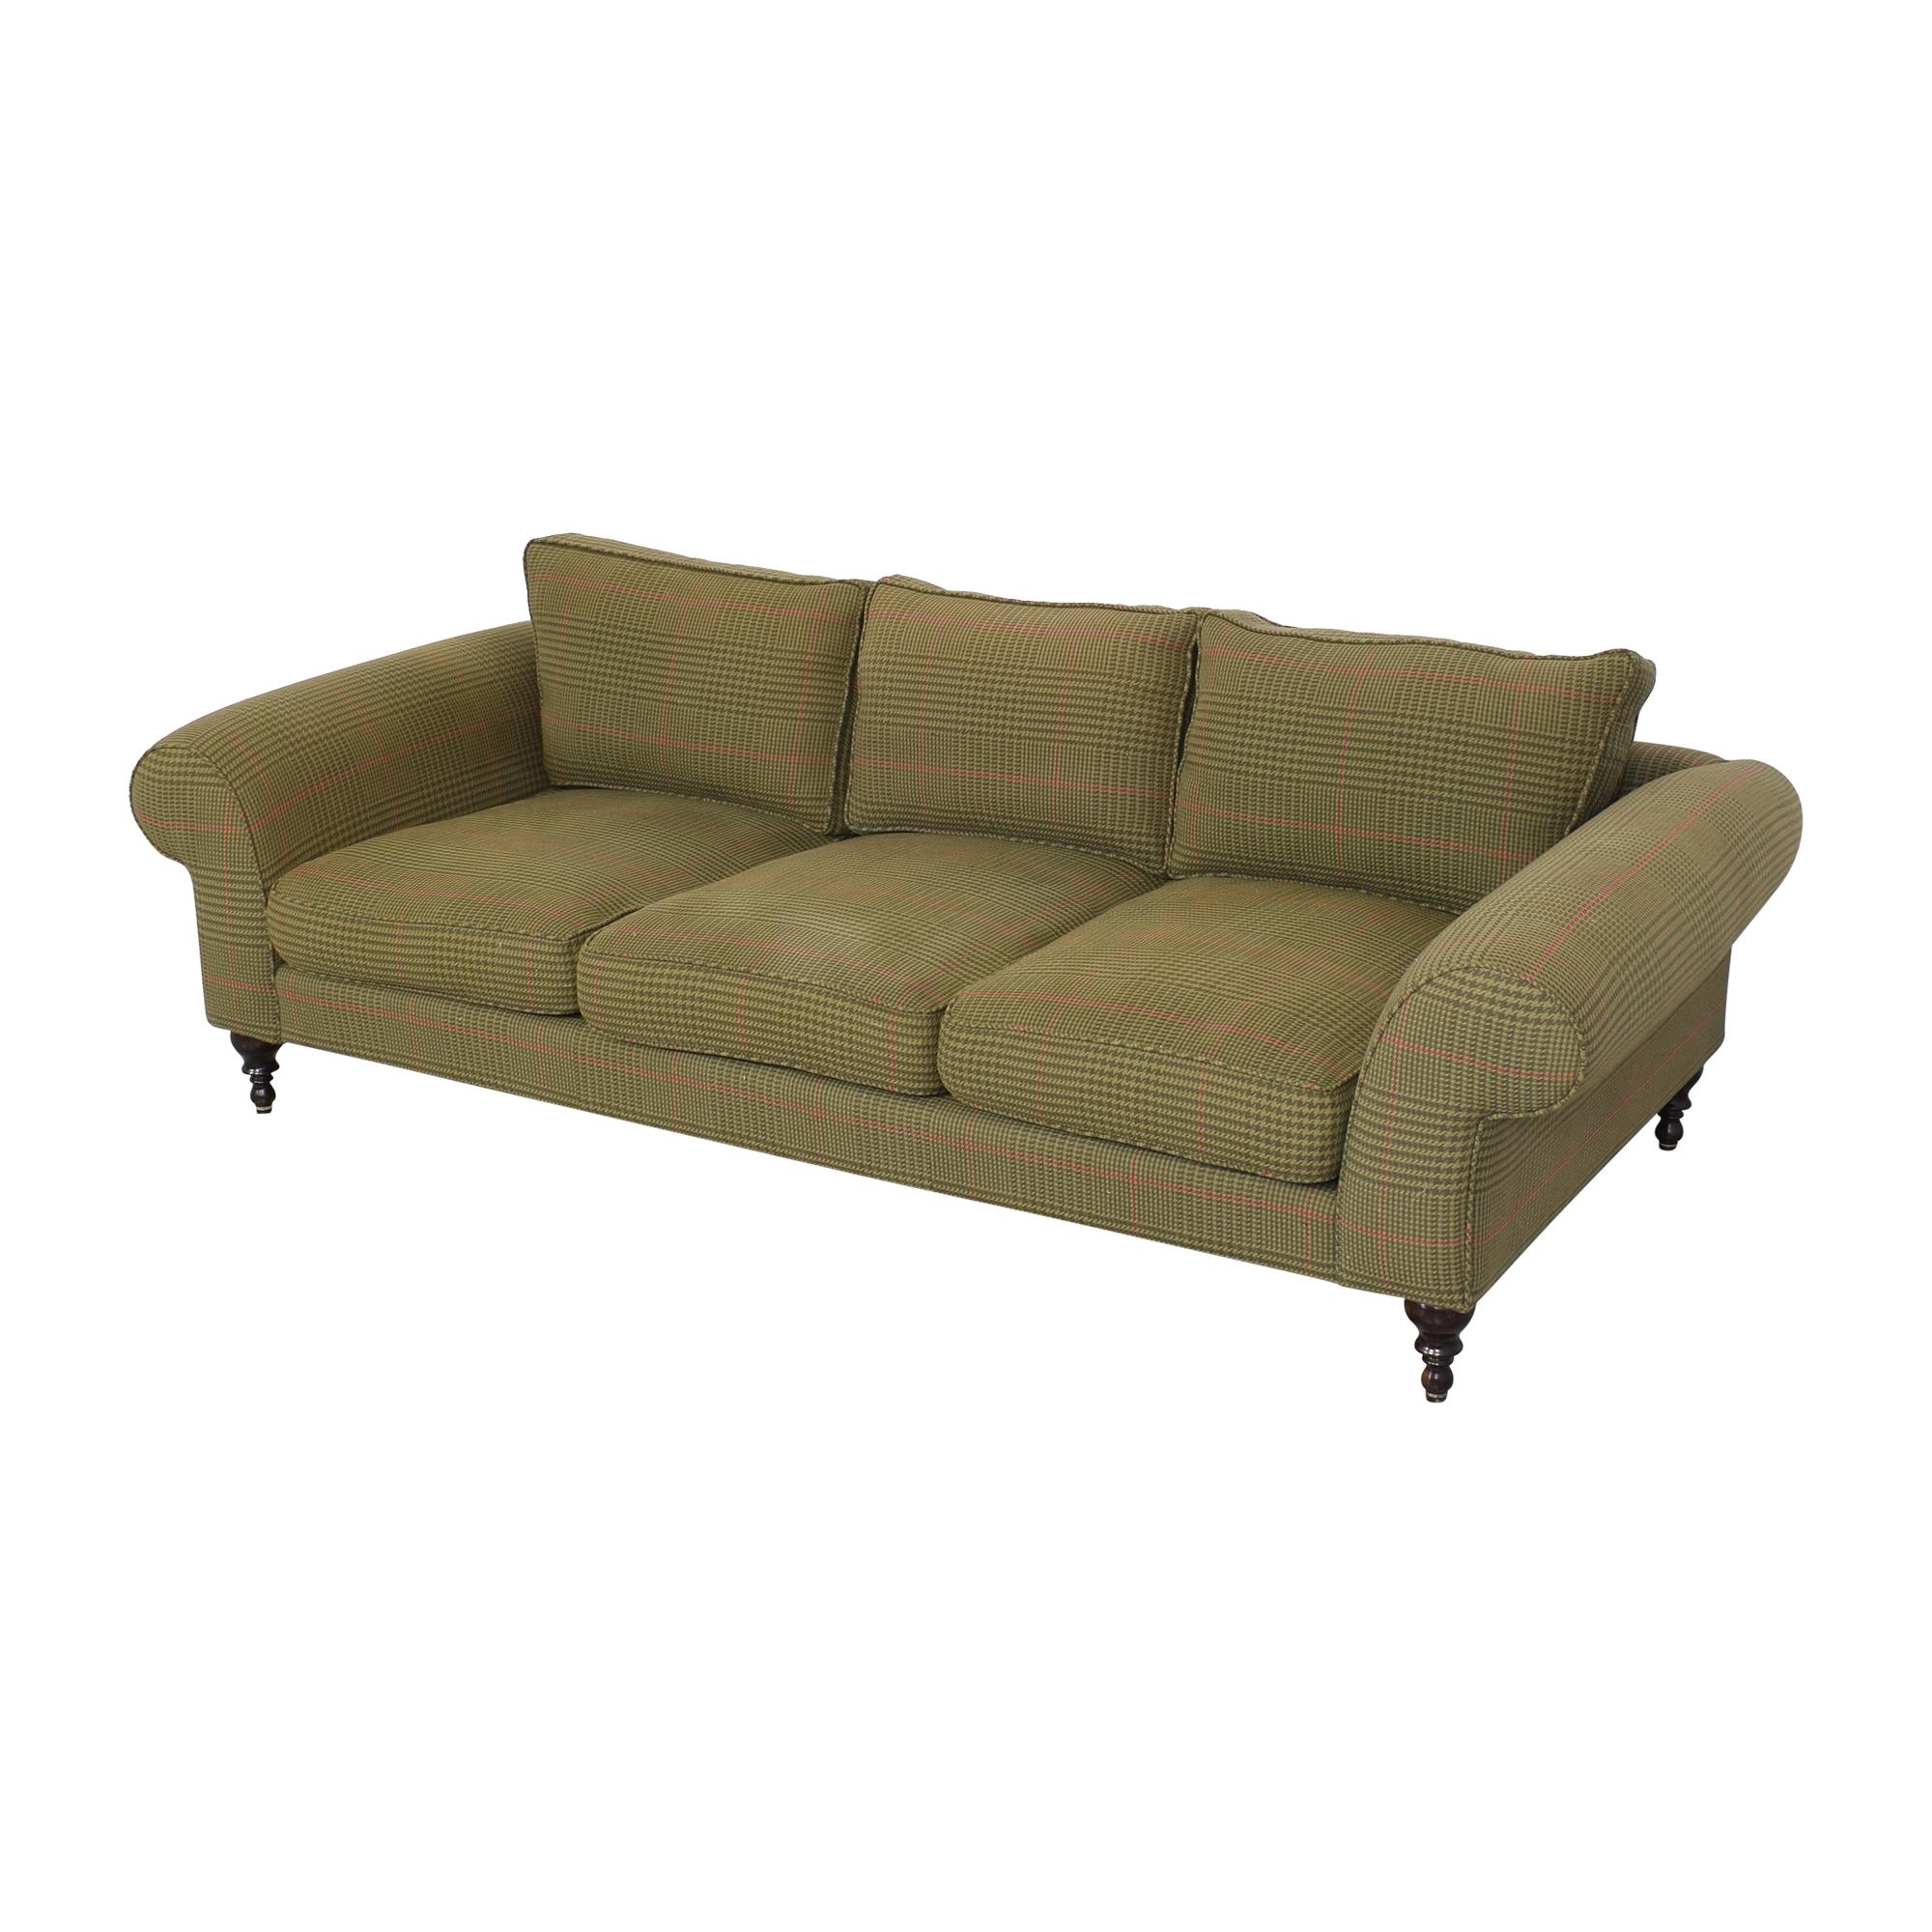 Roll Arm Three Seat Sofa ma